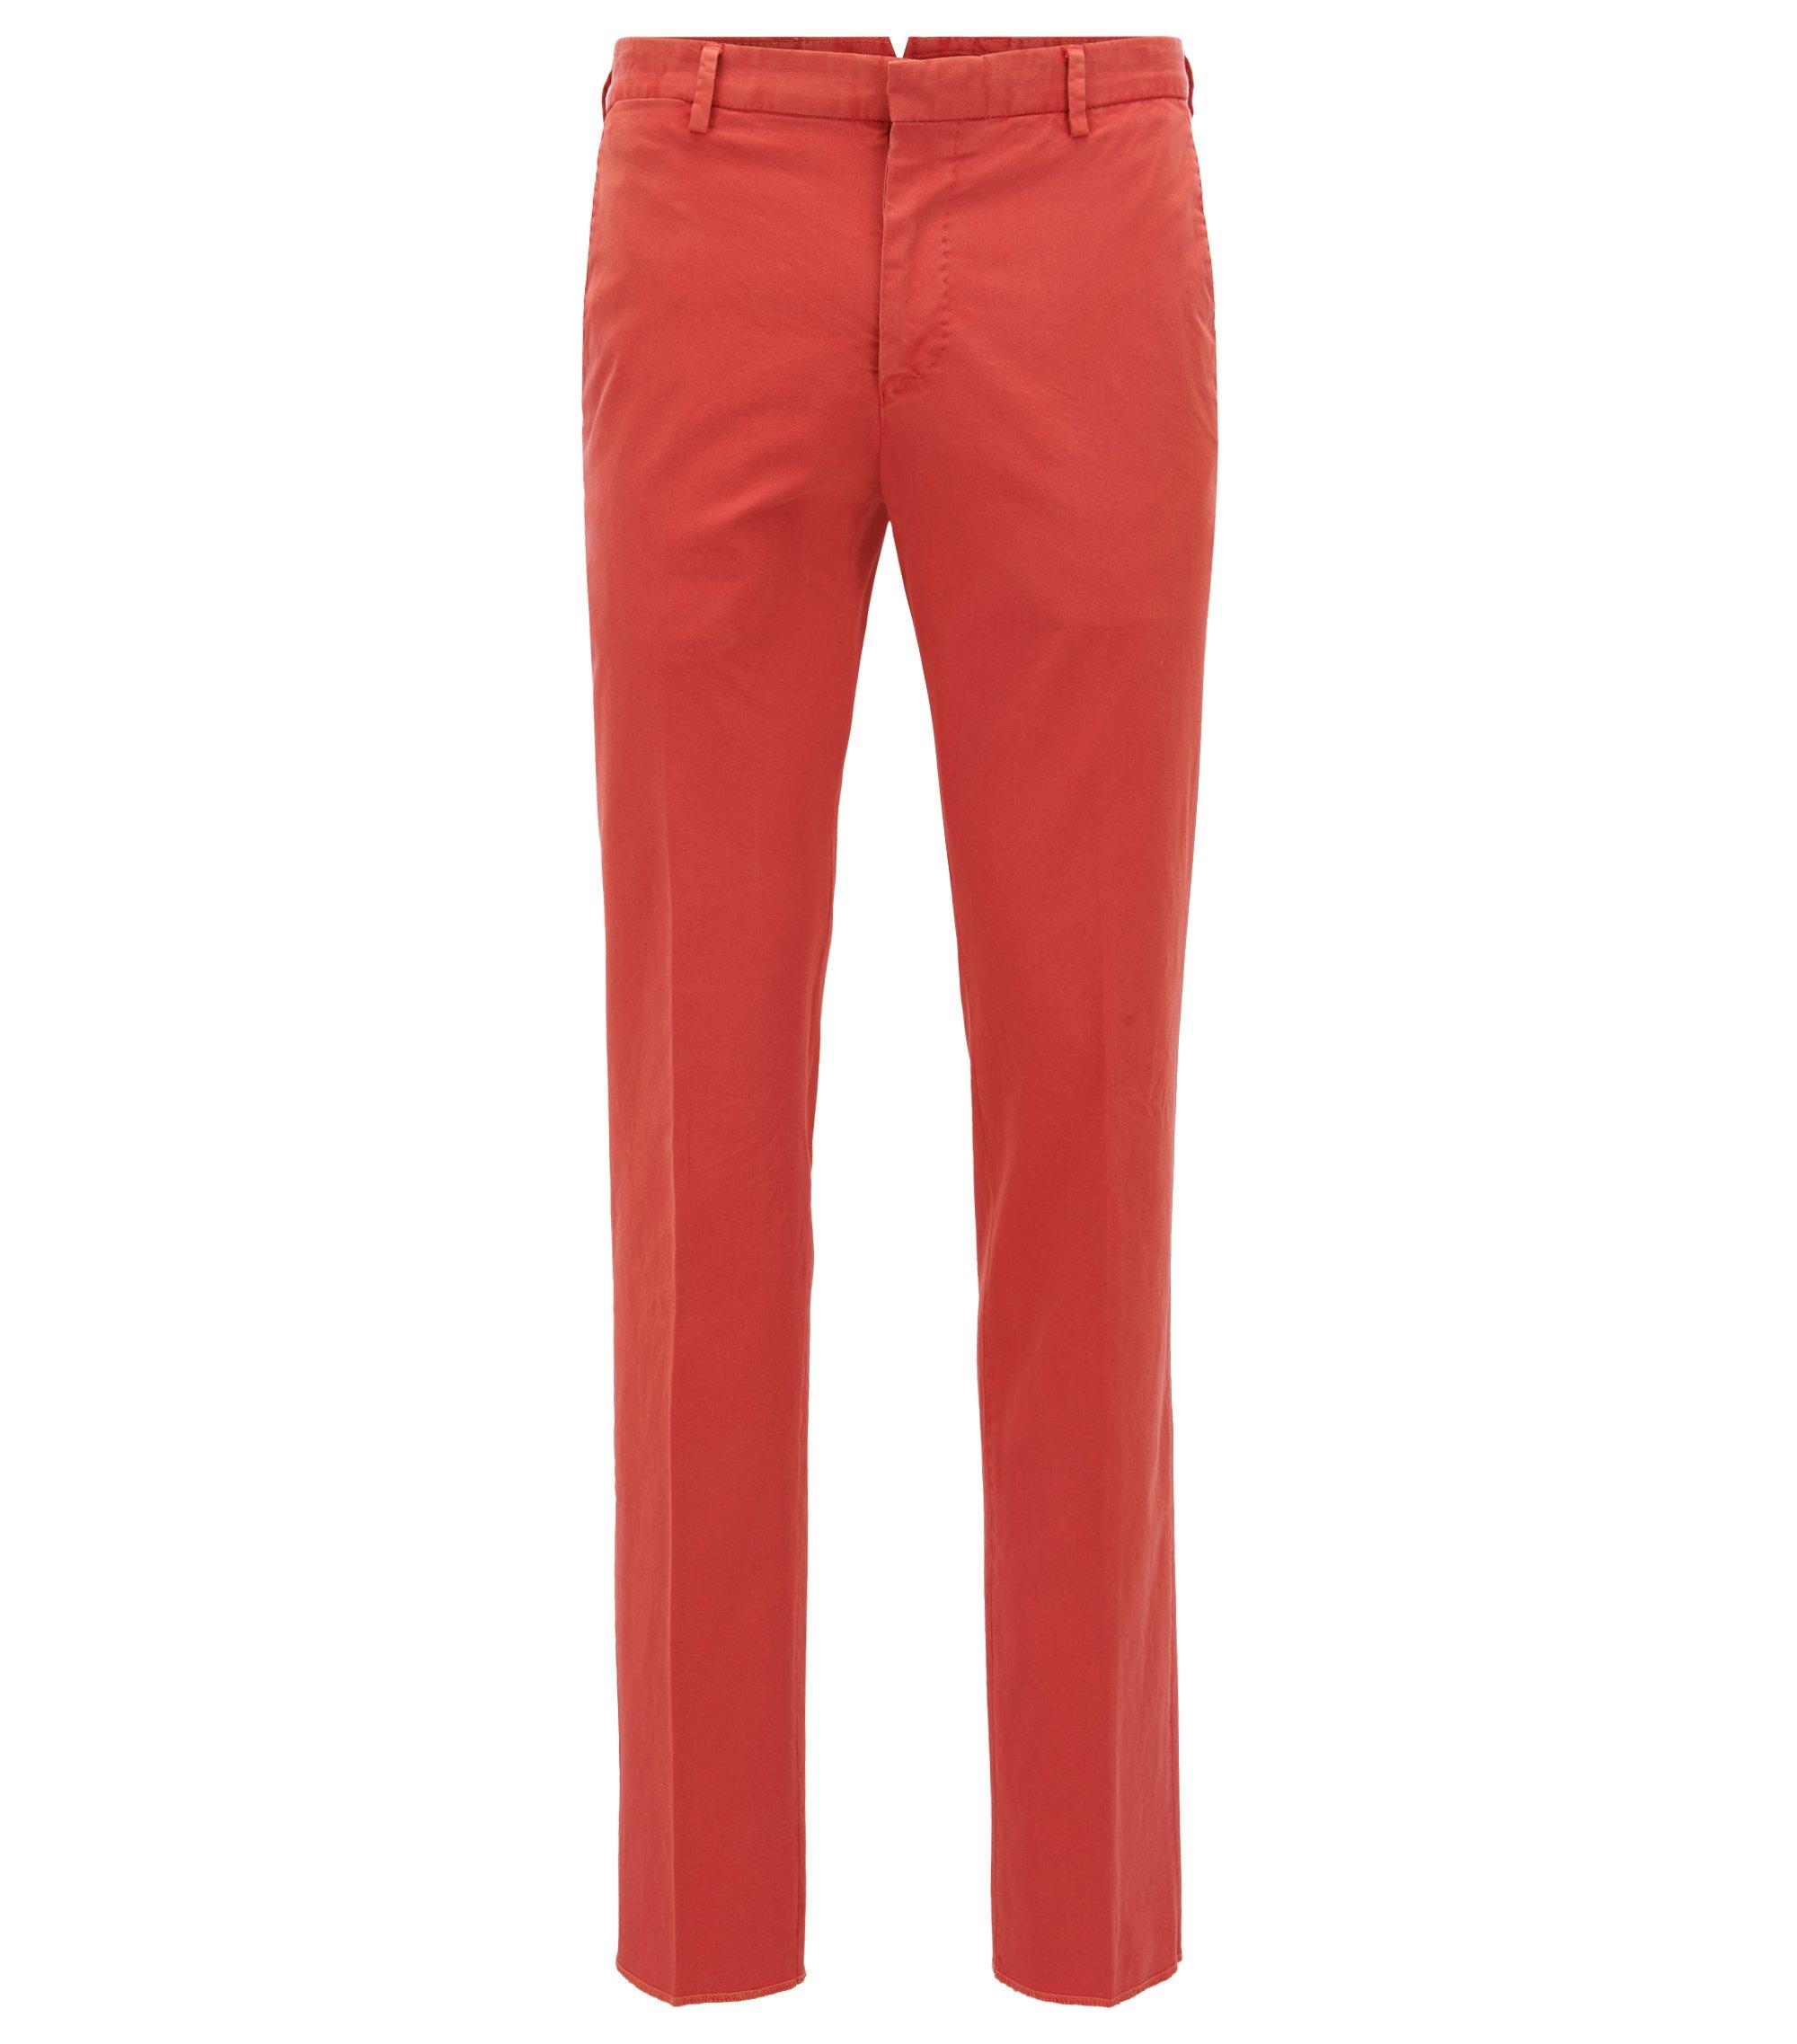 Garment-Dyed Stretch Cotton Suiting Pant, Slim Fit | Barlow D, Dark Orange